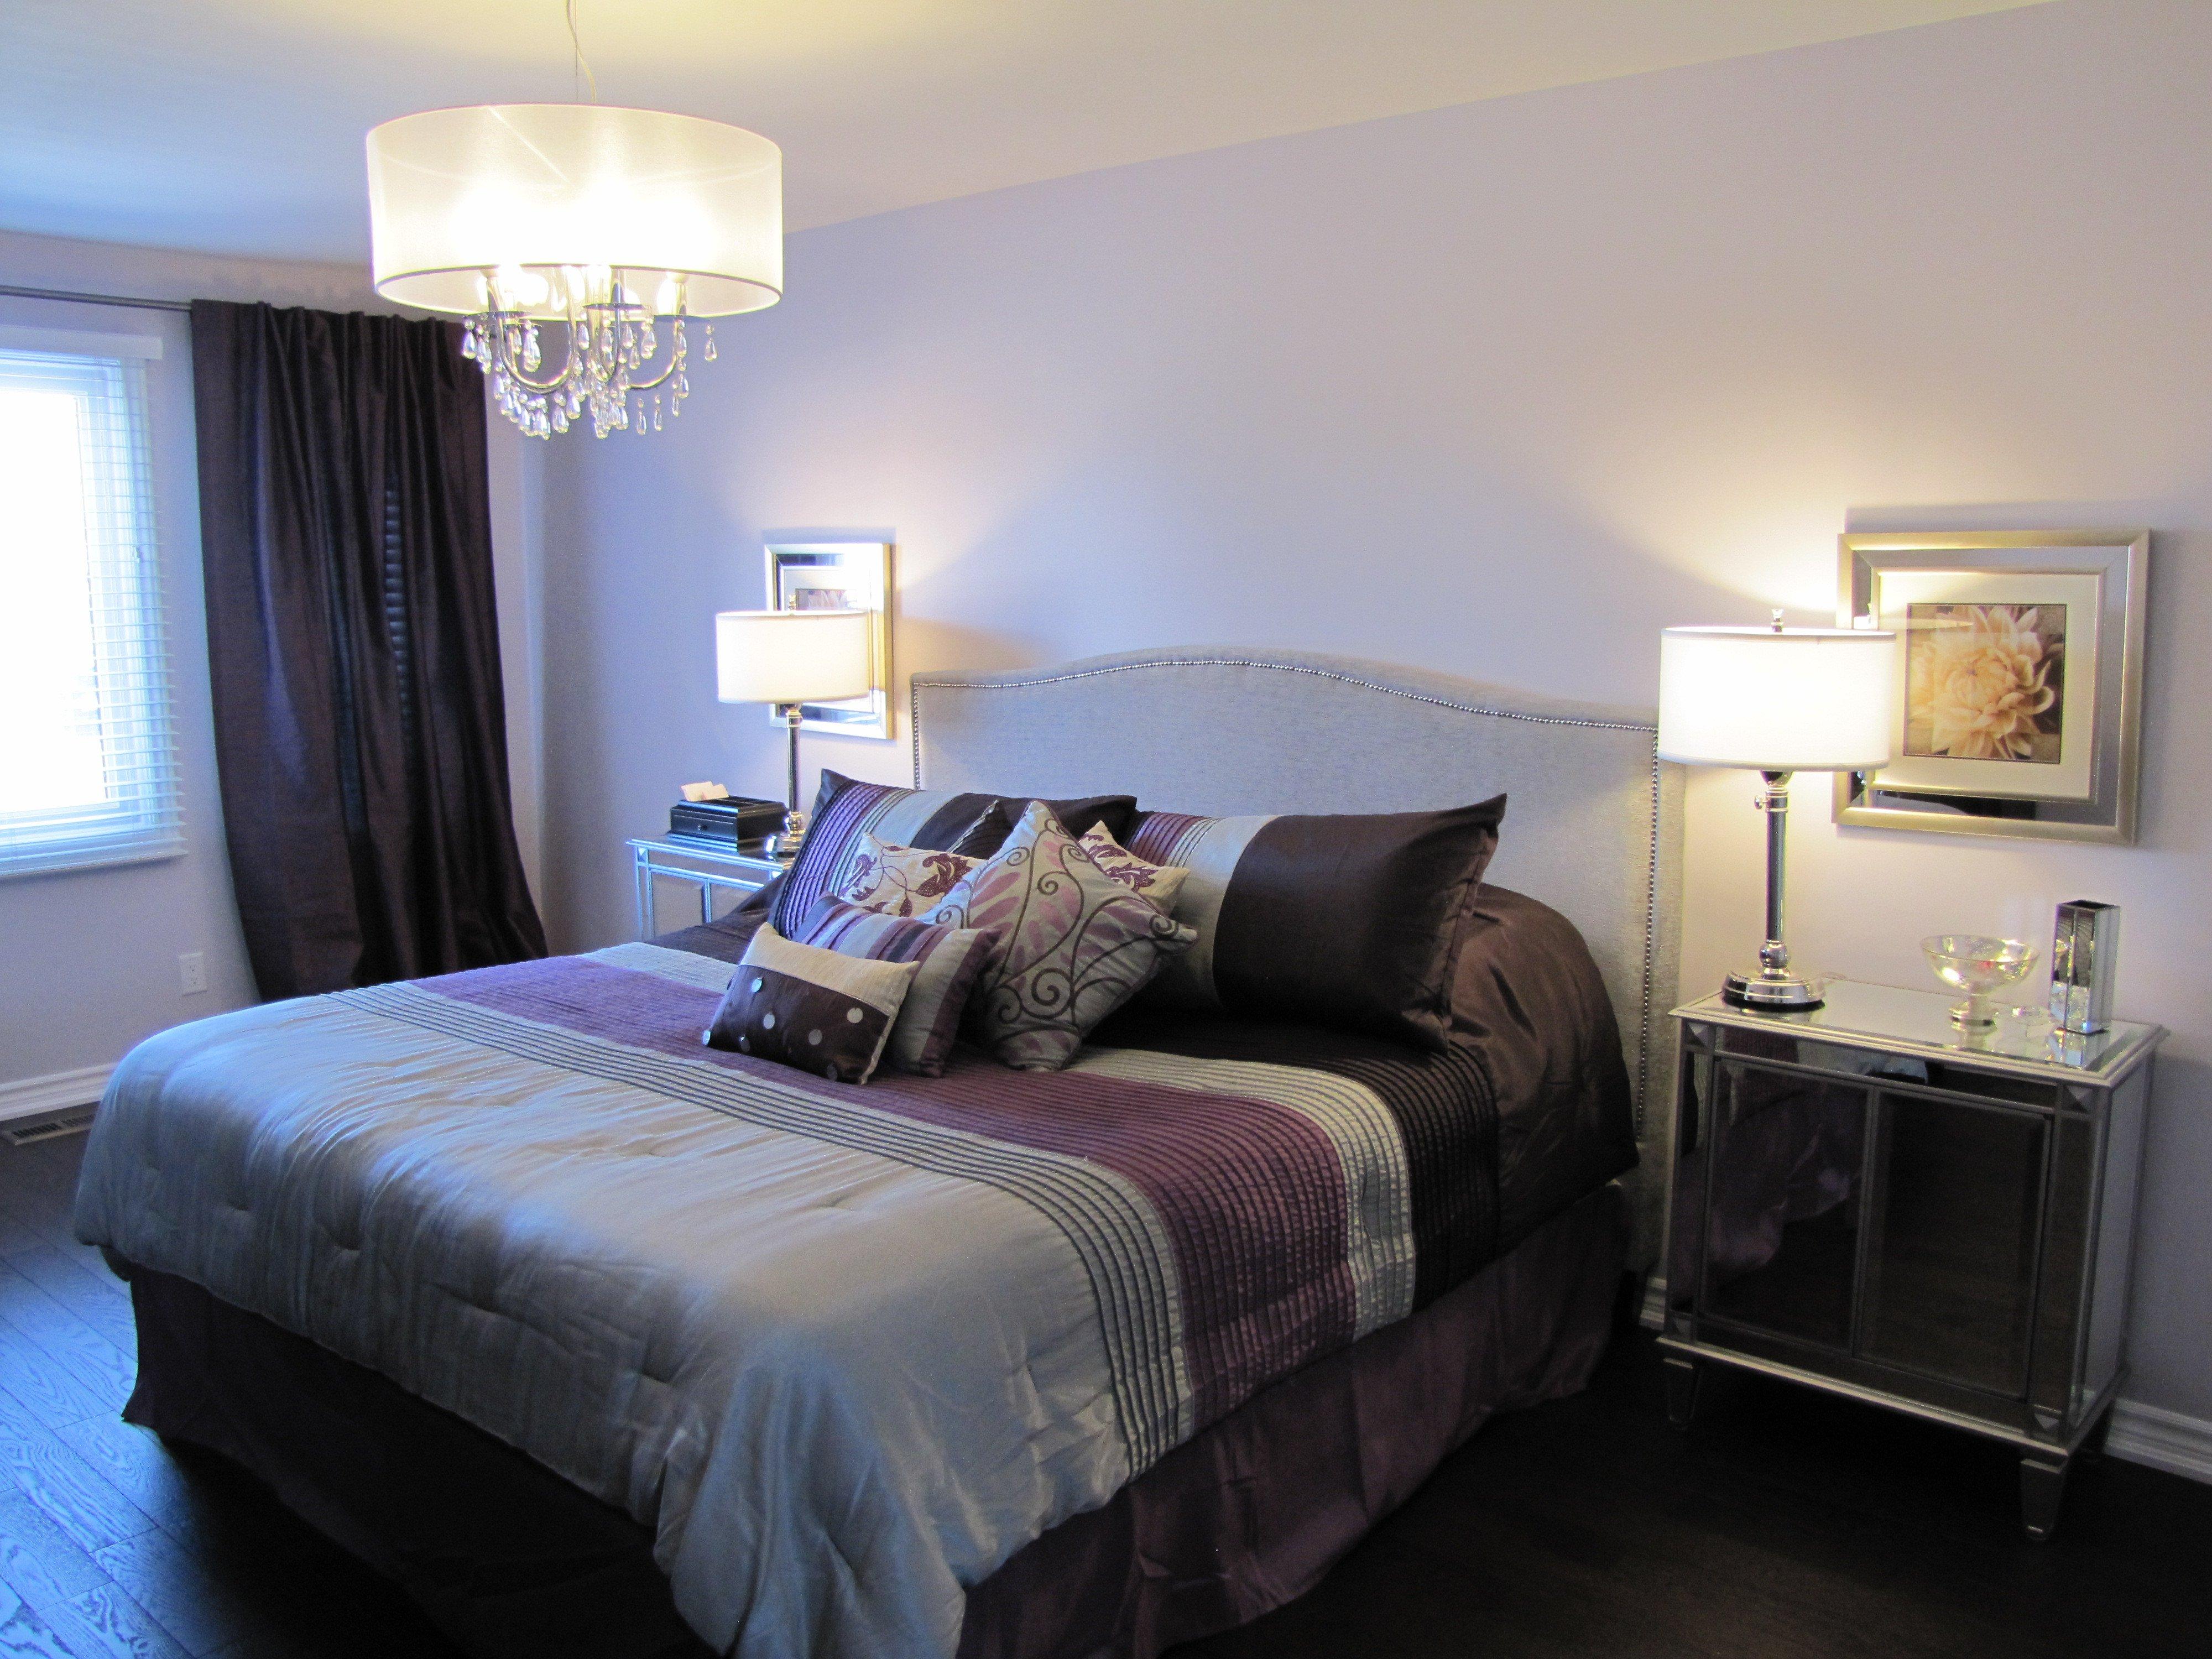 Purple and Grey Bedroom Decor Inspirational January 2012